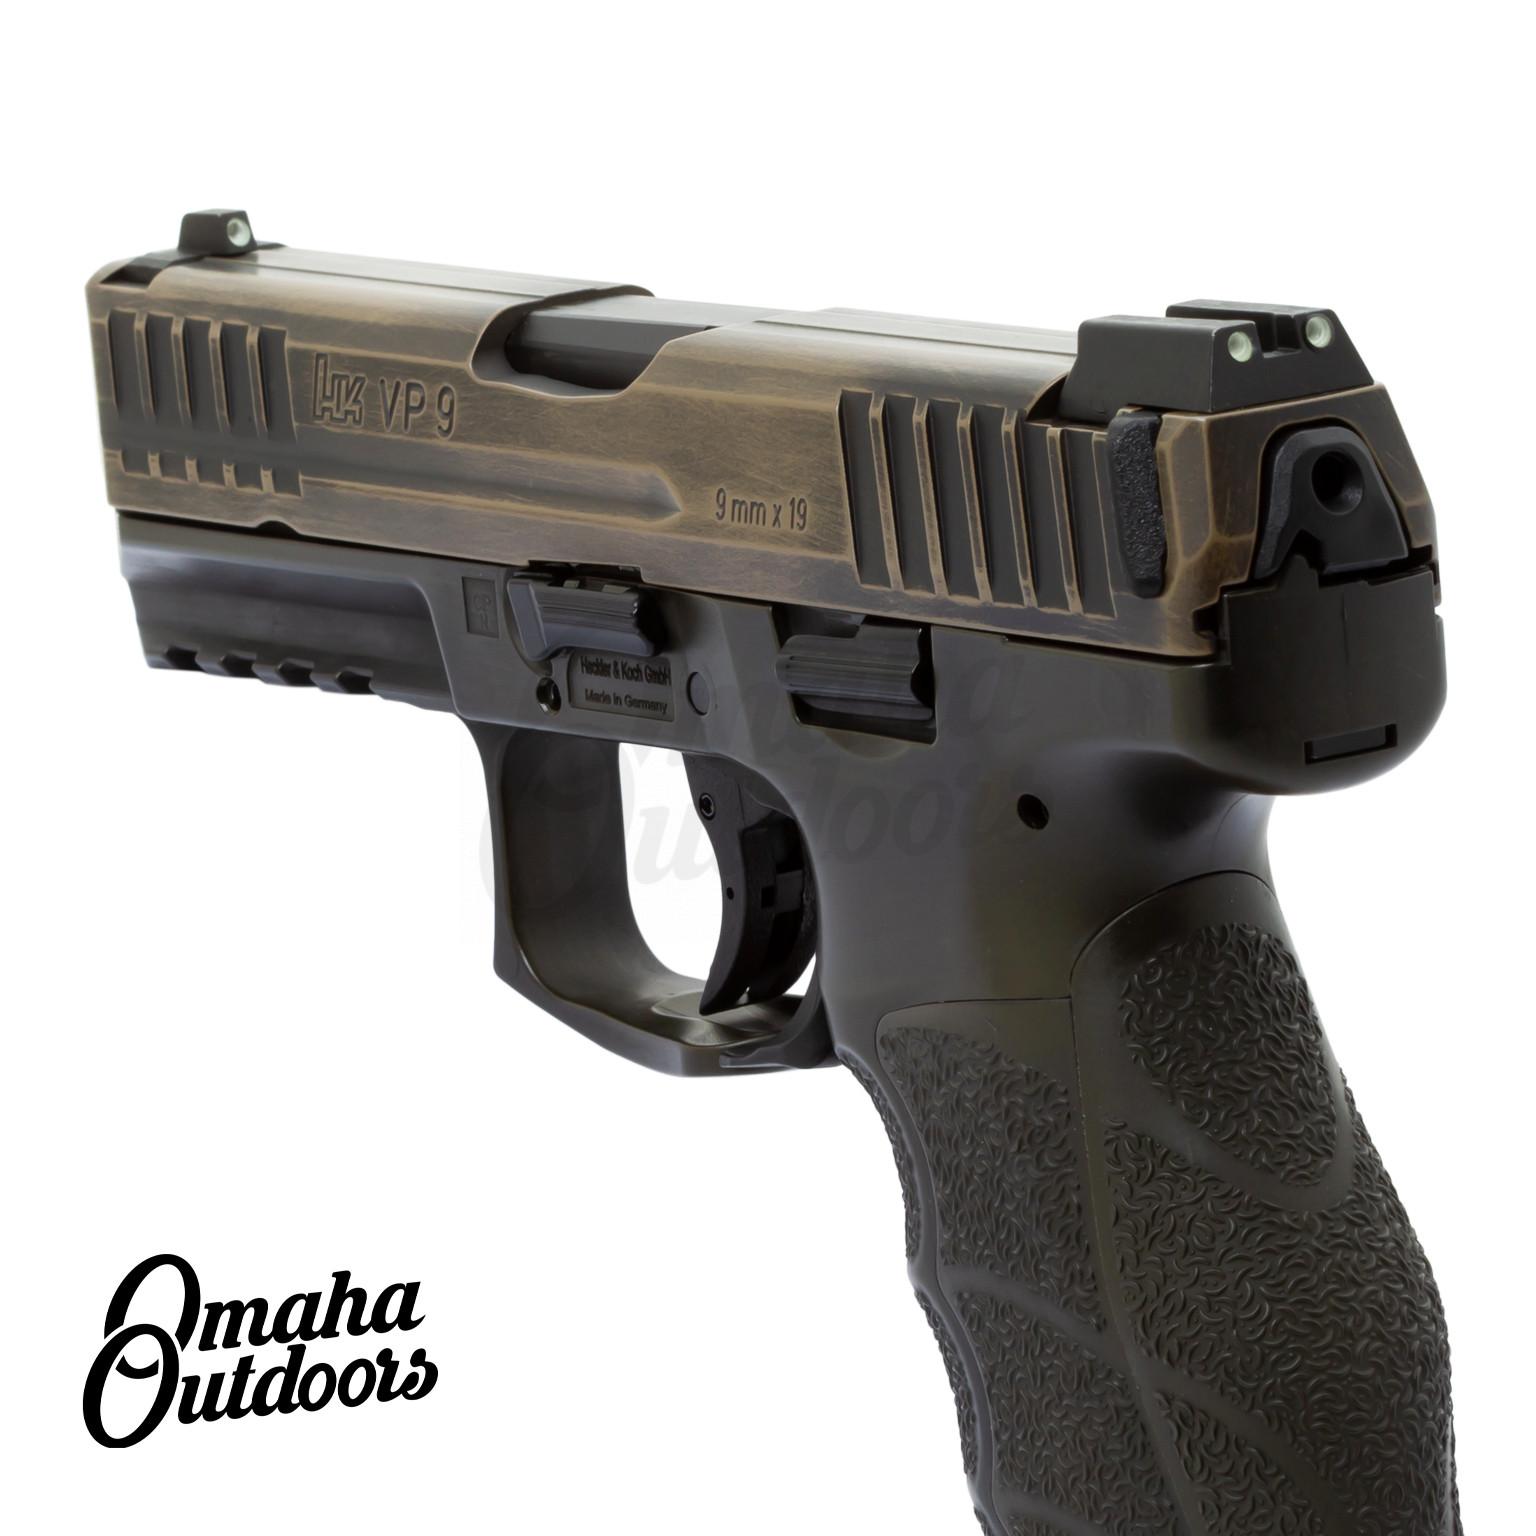 HK VP9 LE OD Green Pistol 17 RD 9mm Night Sights FDE Slide